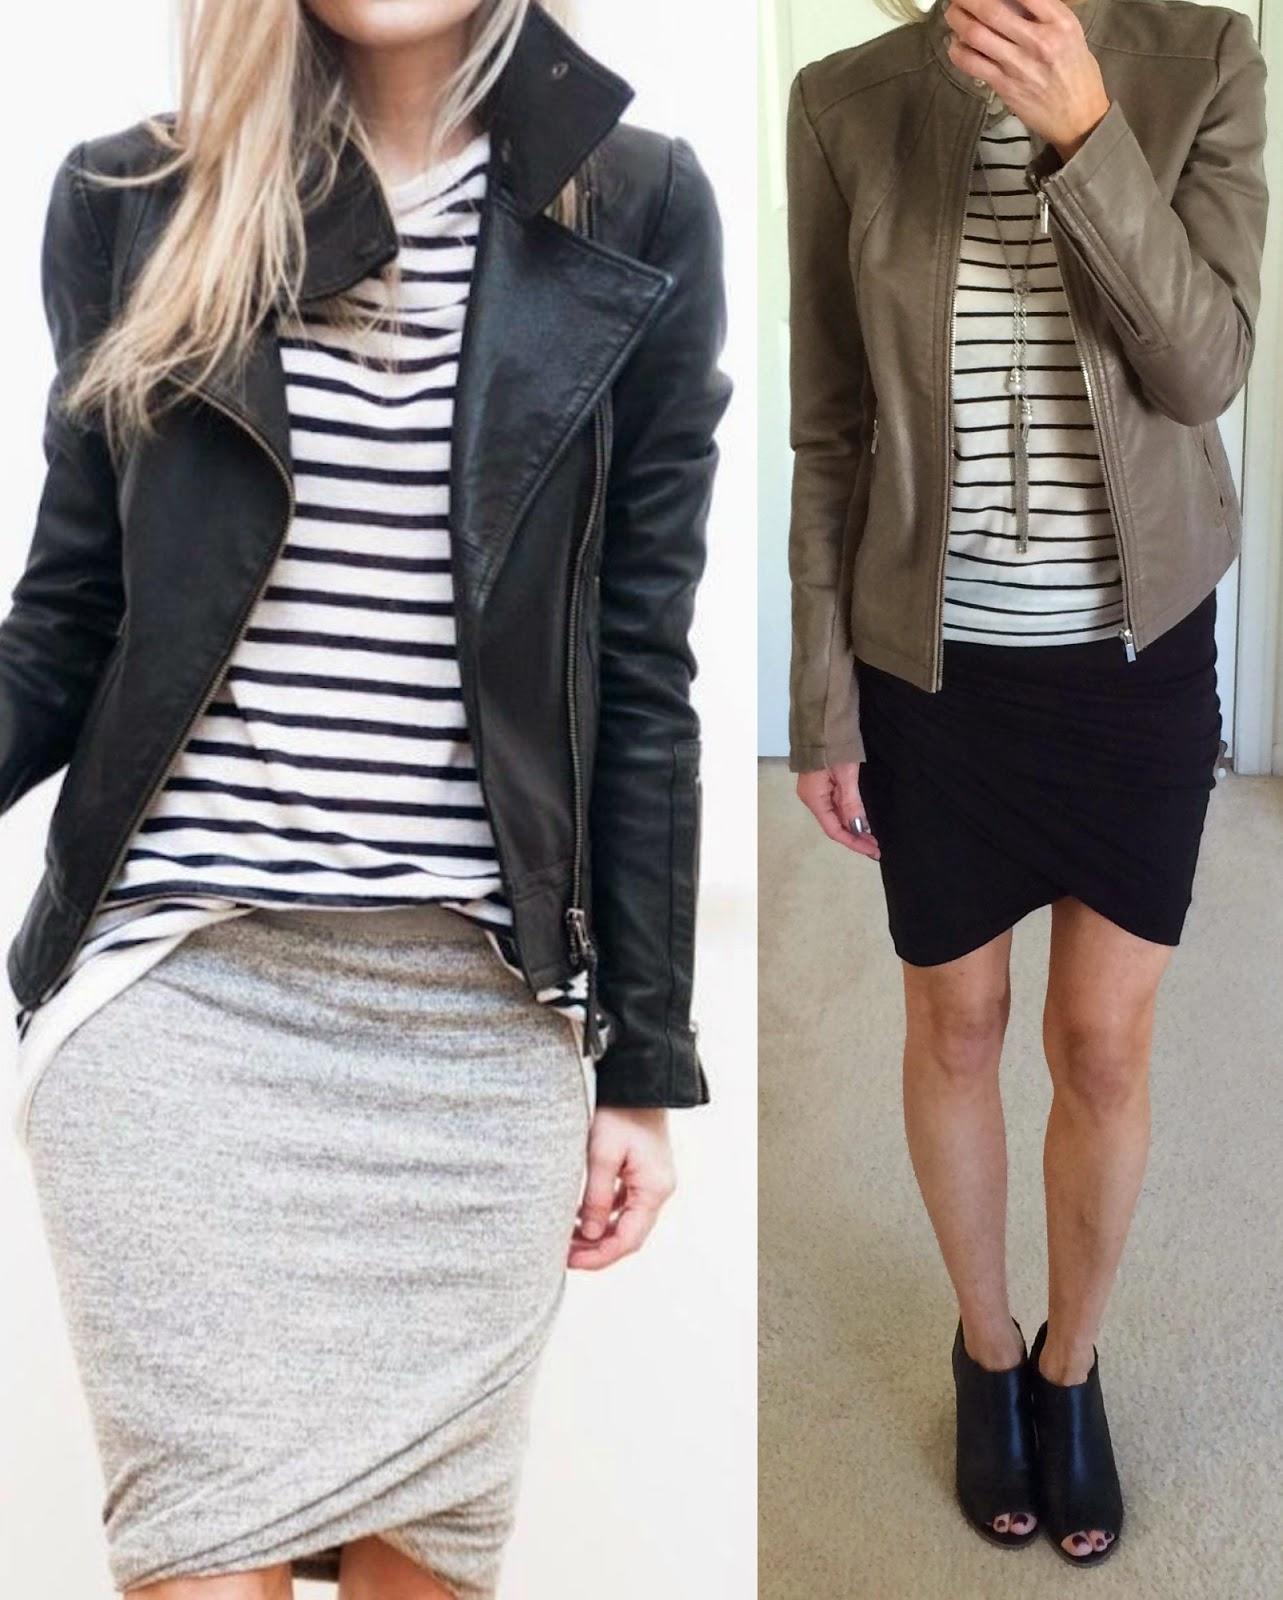 Striped tee, wrap mini skirt